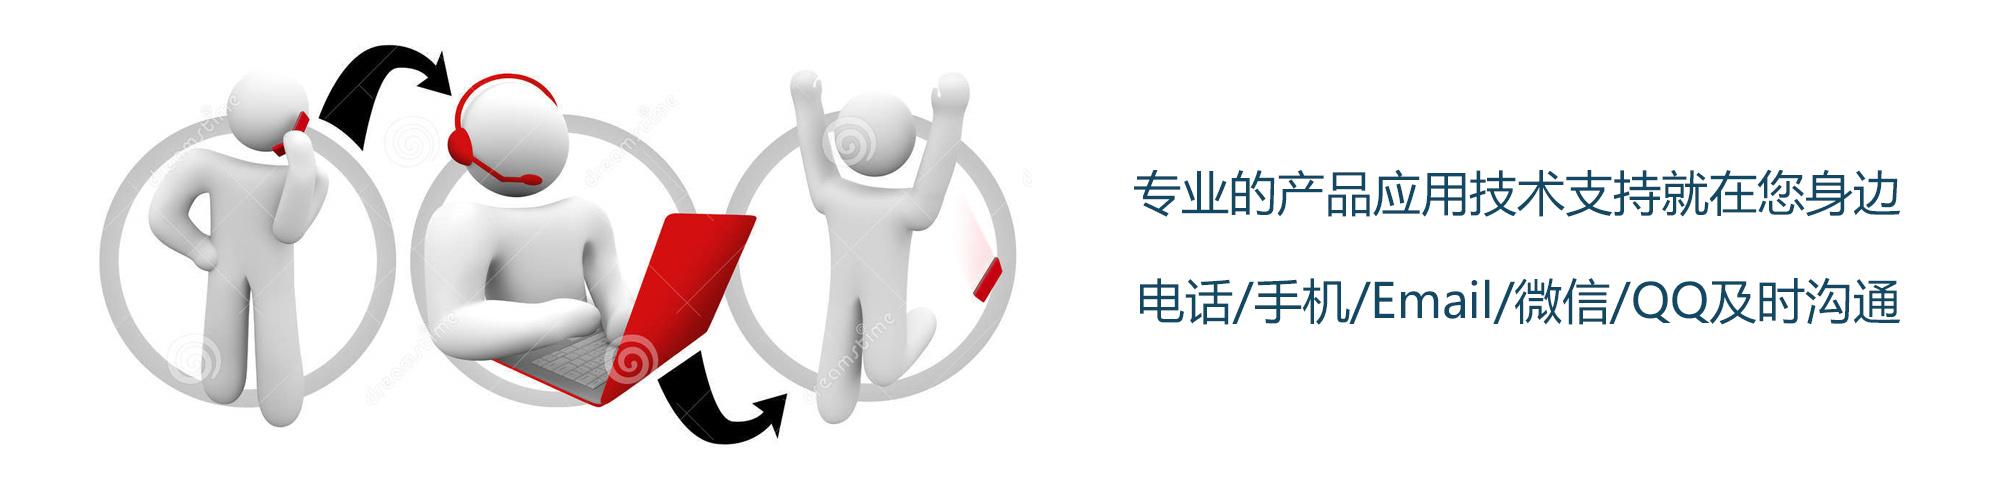 Abnova中国区满意技术支持